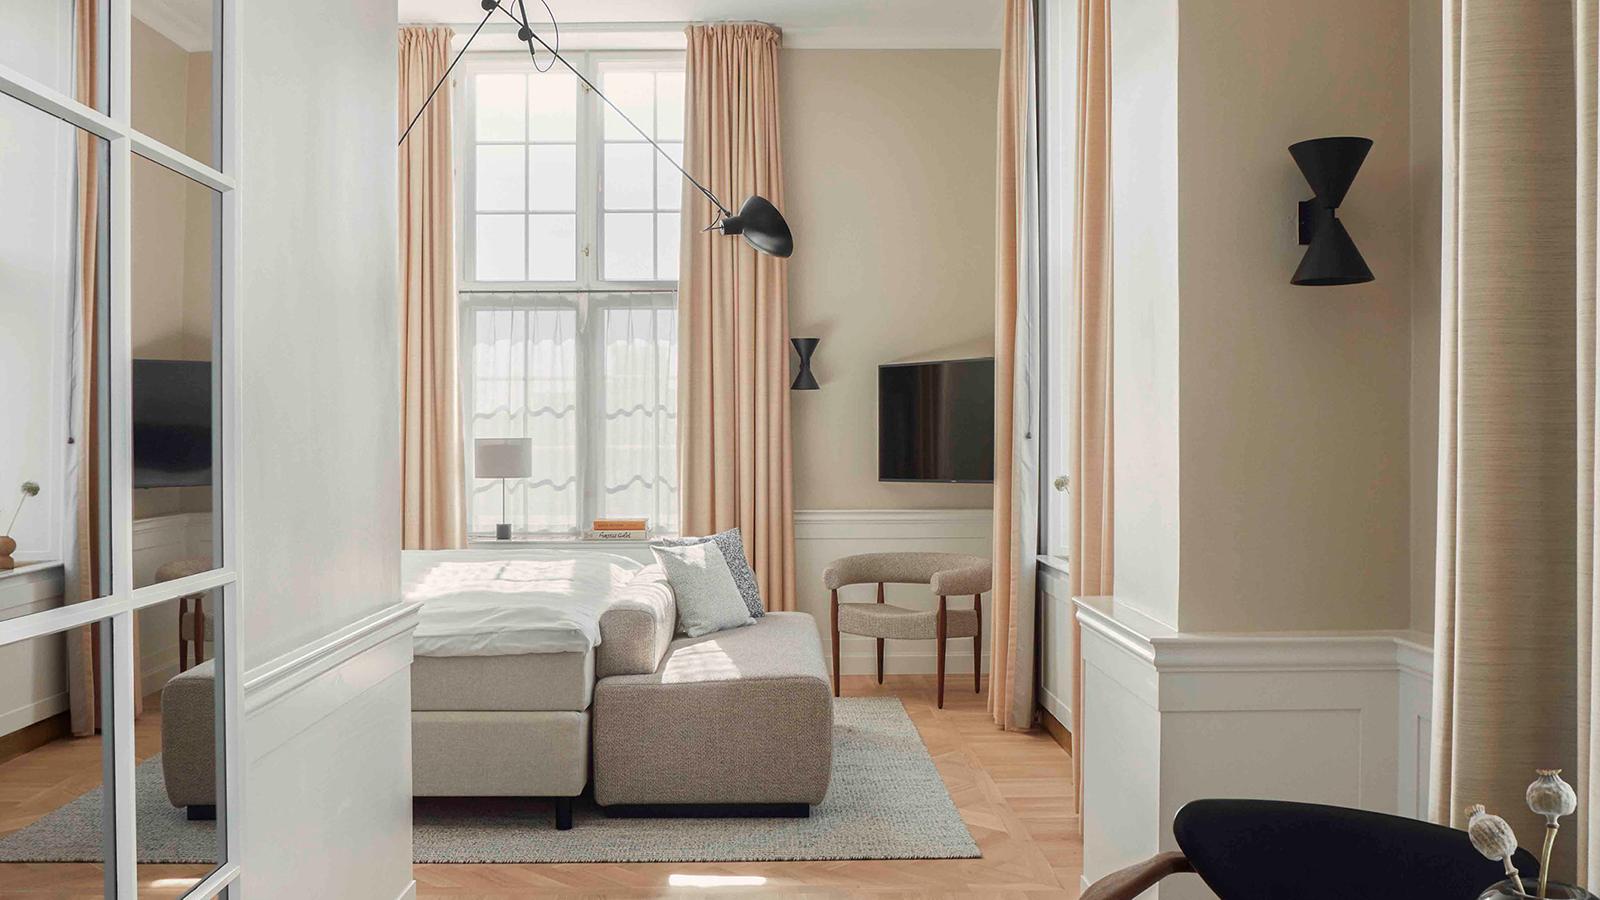 Image of Guestroom at Villa Copenhagen, 1912, Member of Historic Hotels Worldwide, in Copenhagen, Denmark, Accommodations